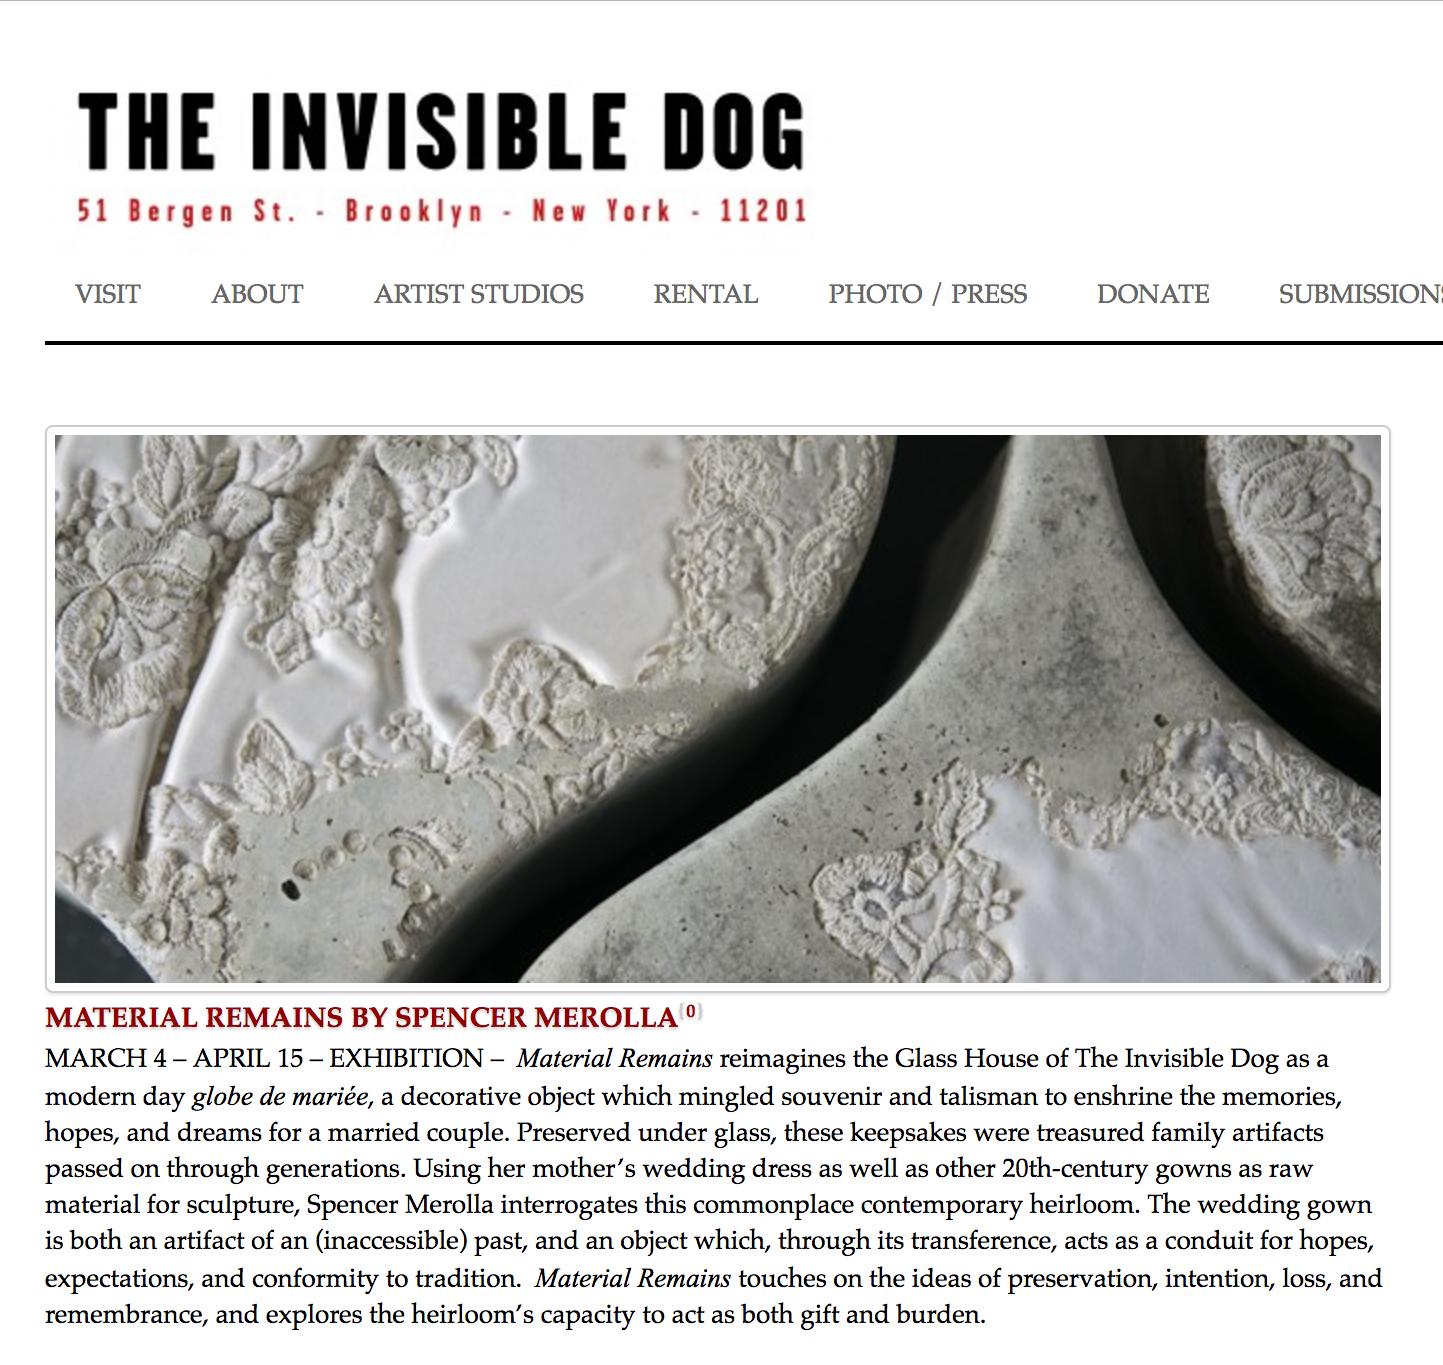 smerolla_invisibledog.jpg